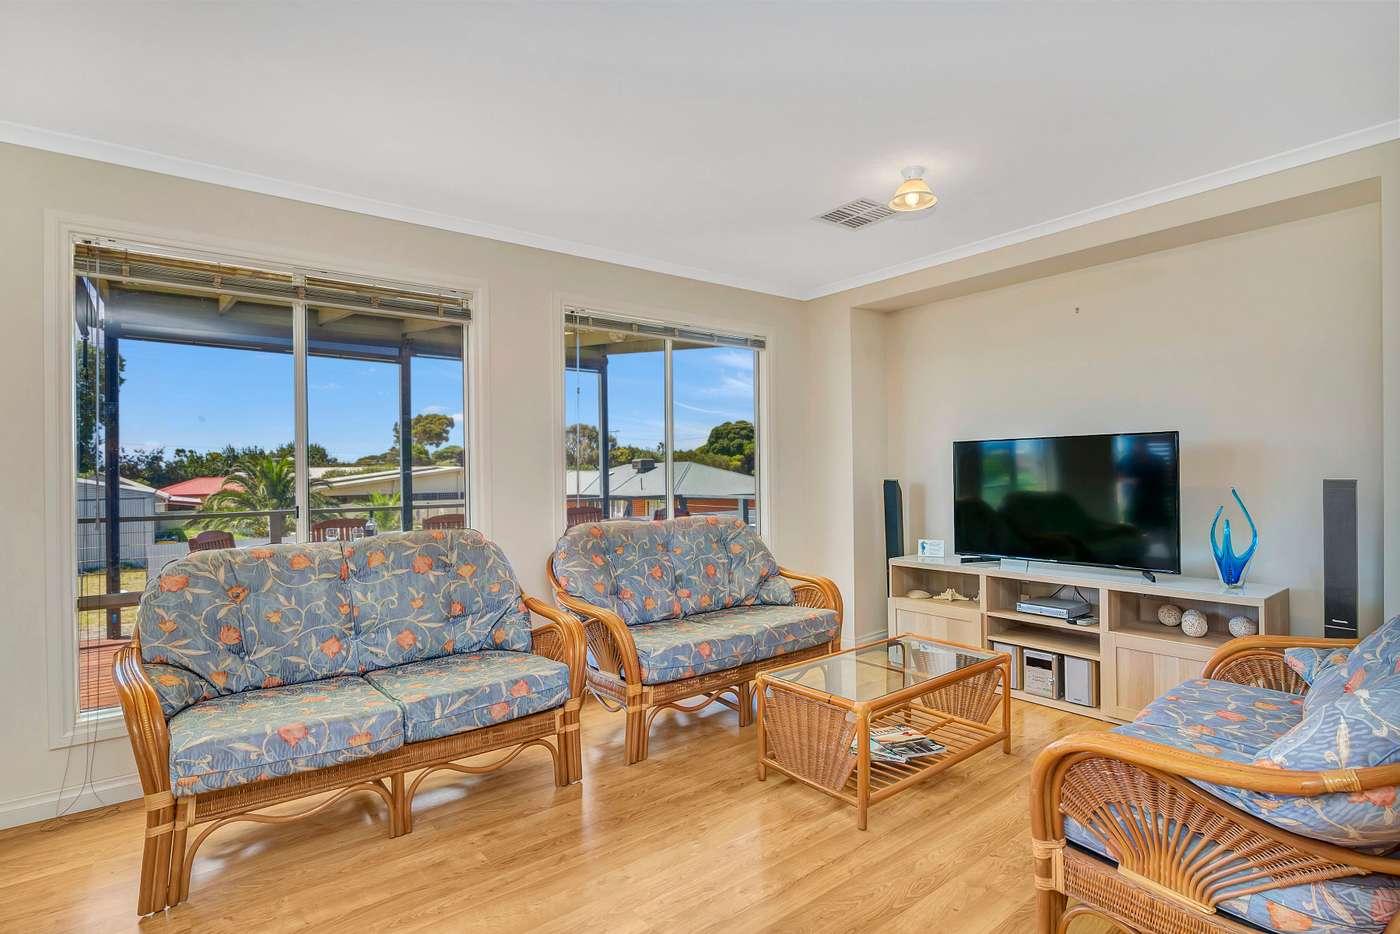 Fifth view of Homely house listing, 4 Thomas Street, Aldinga Beach SA 5173